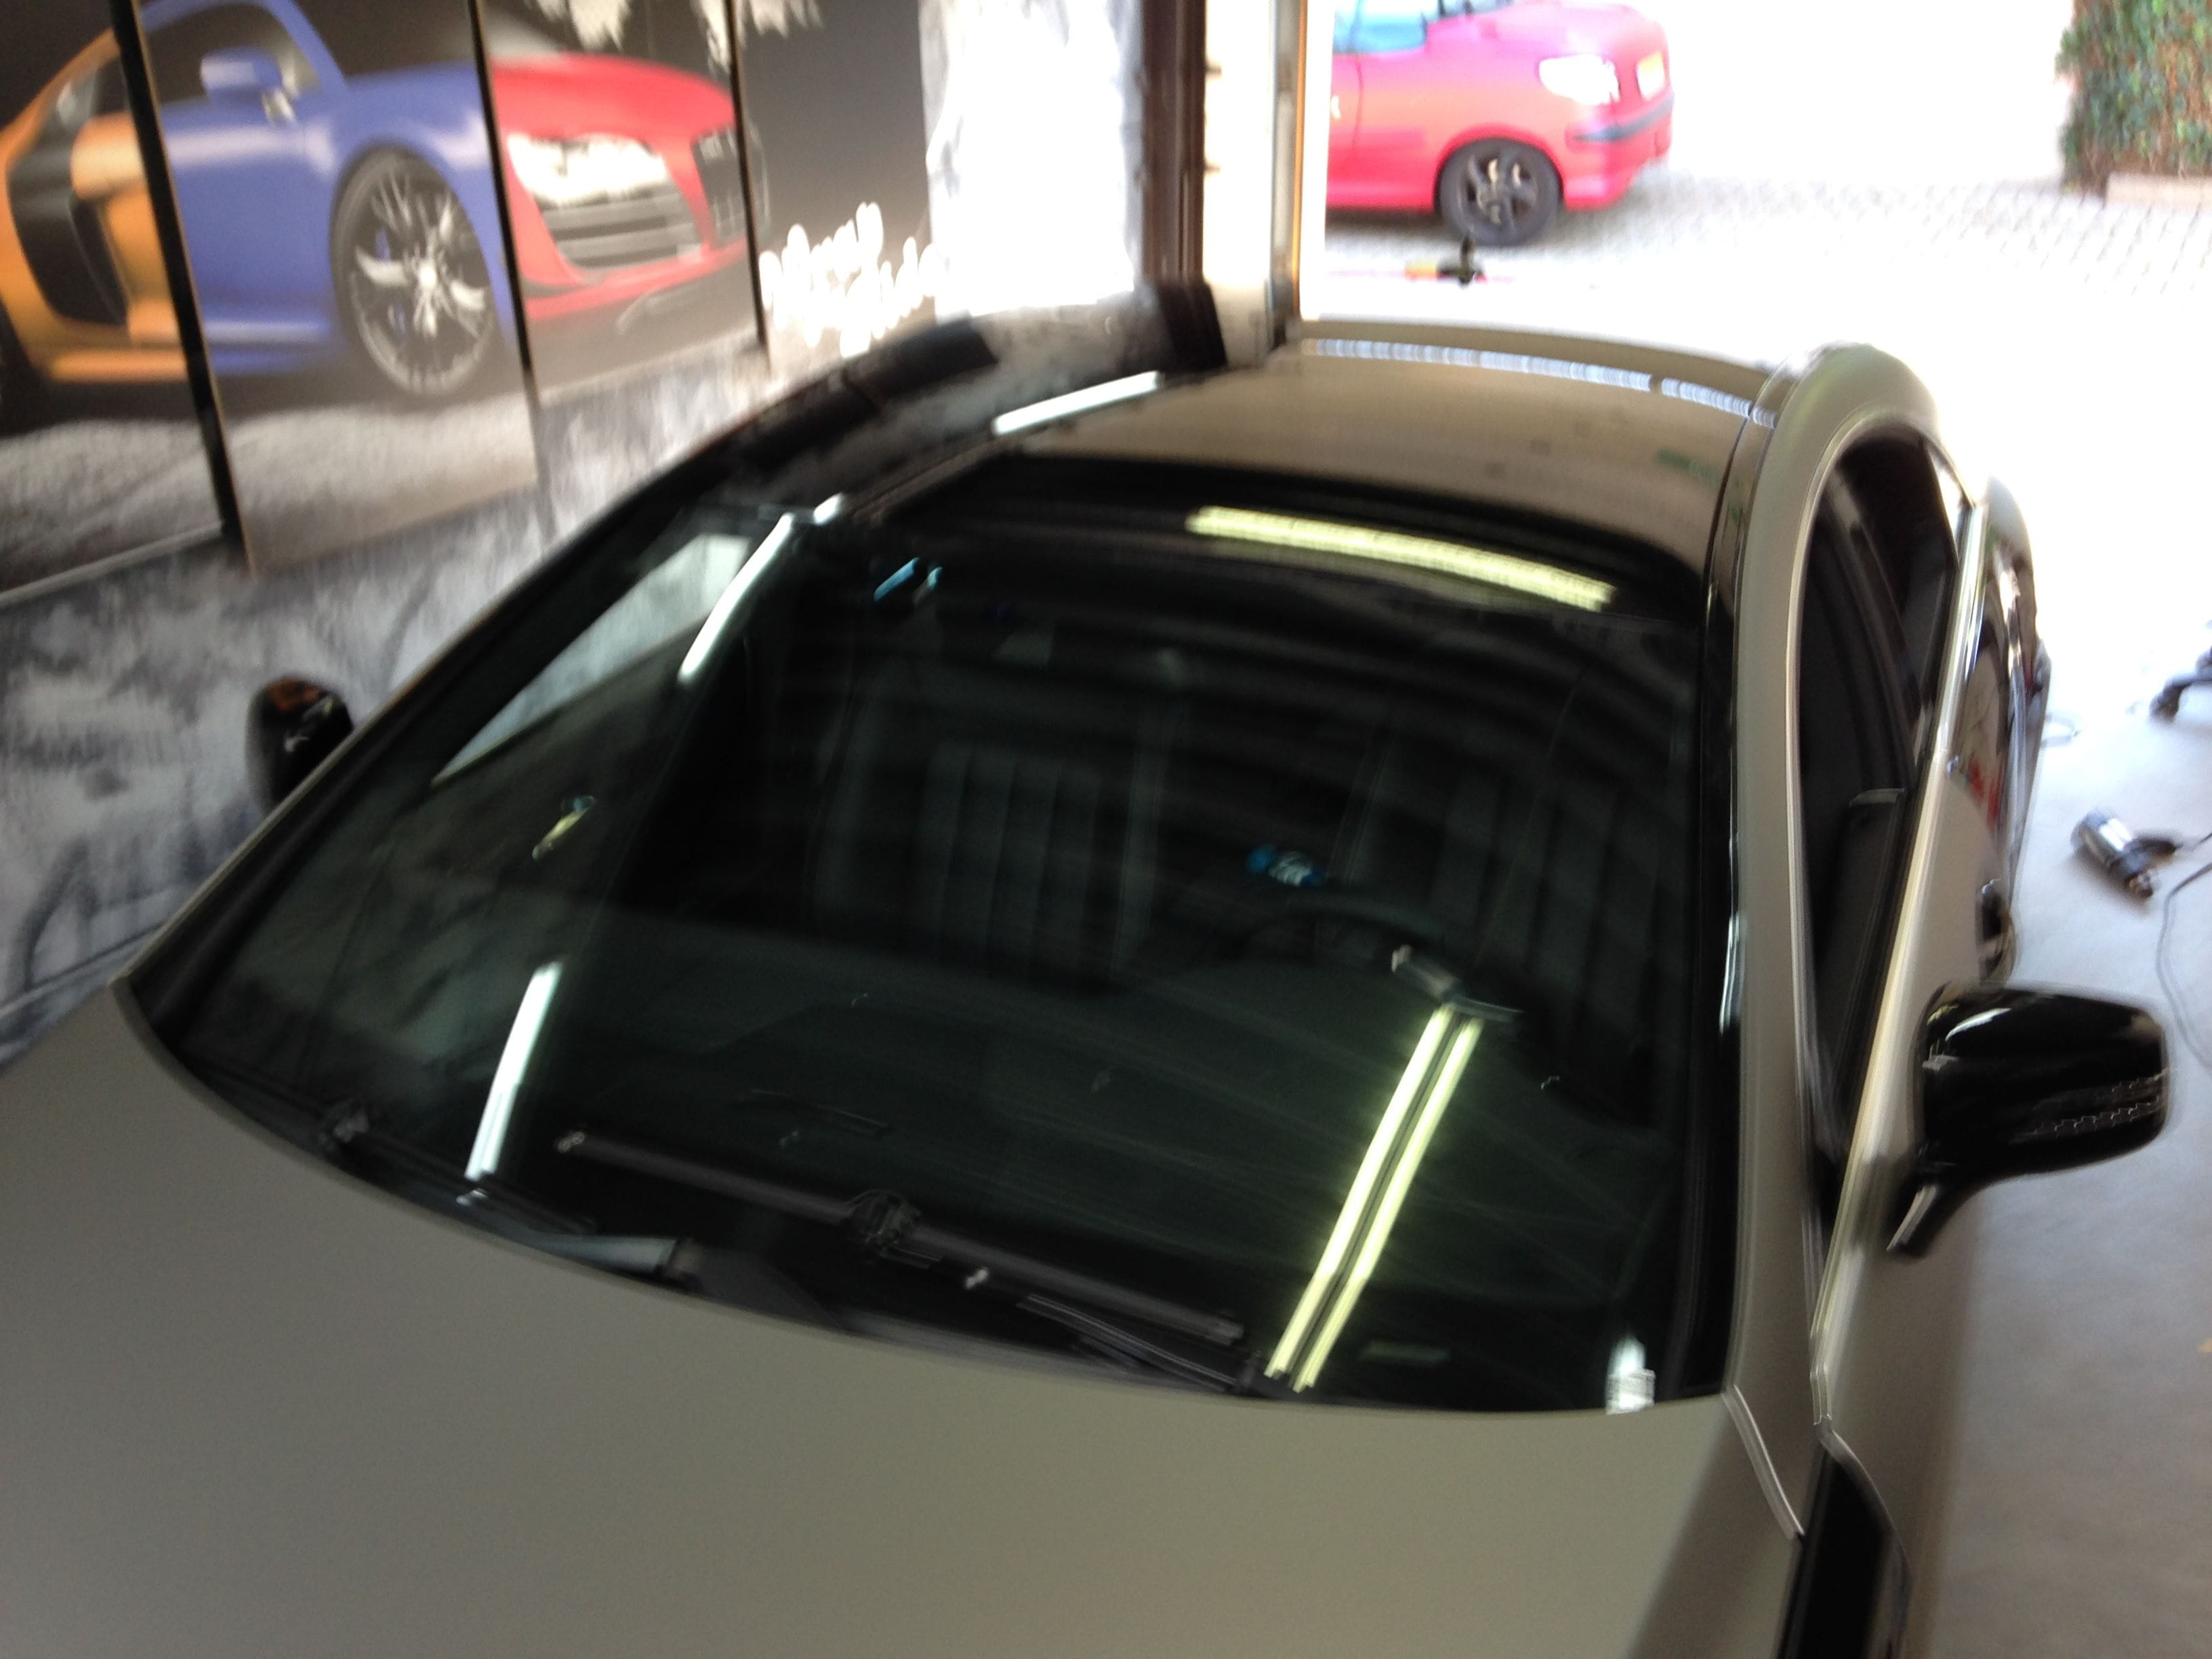 Mercedes CLS met Mat Grey Aluminium Wrap, Carwrapping door Wrapmyride.nu Foto-nr:6131, ©2020